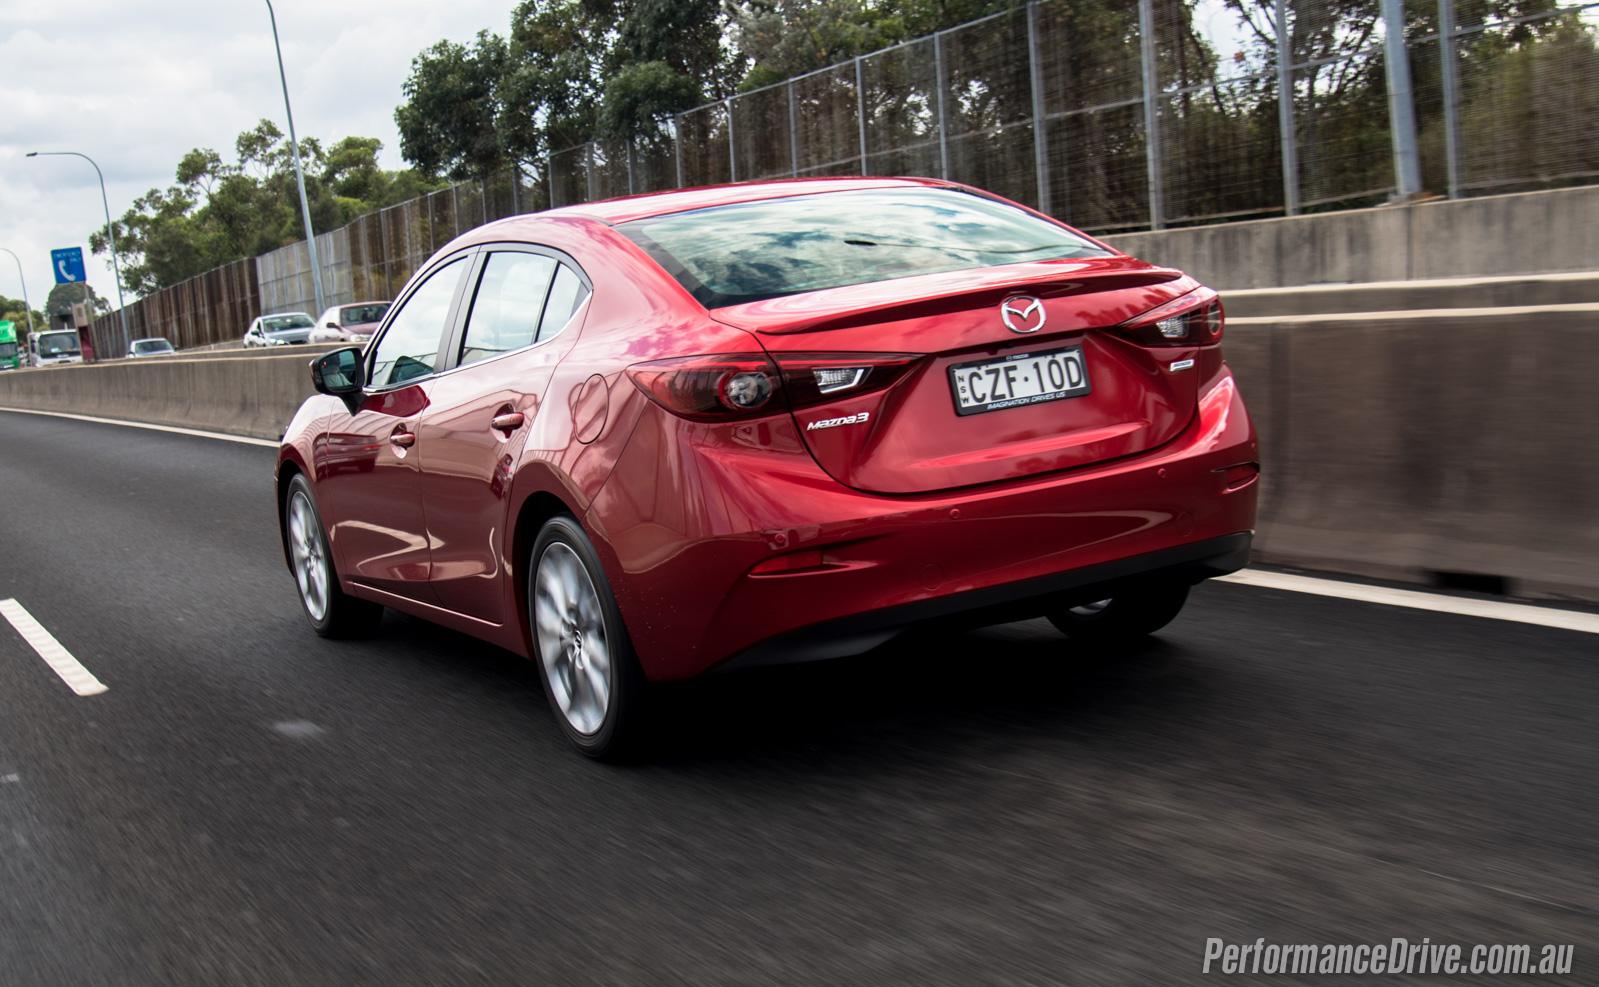 2016 Mazda3 SP25 Astina review (video) | PerformanceDrive